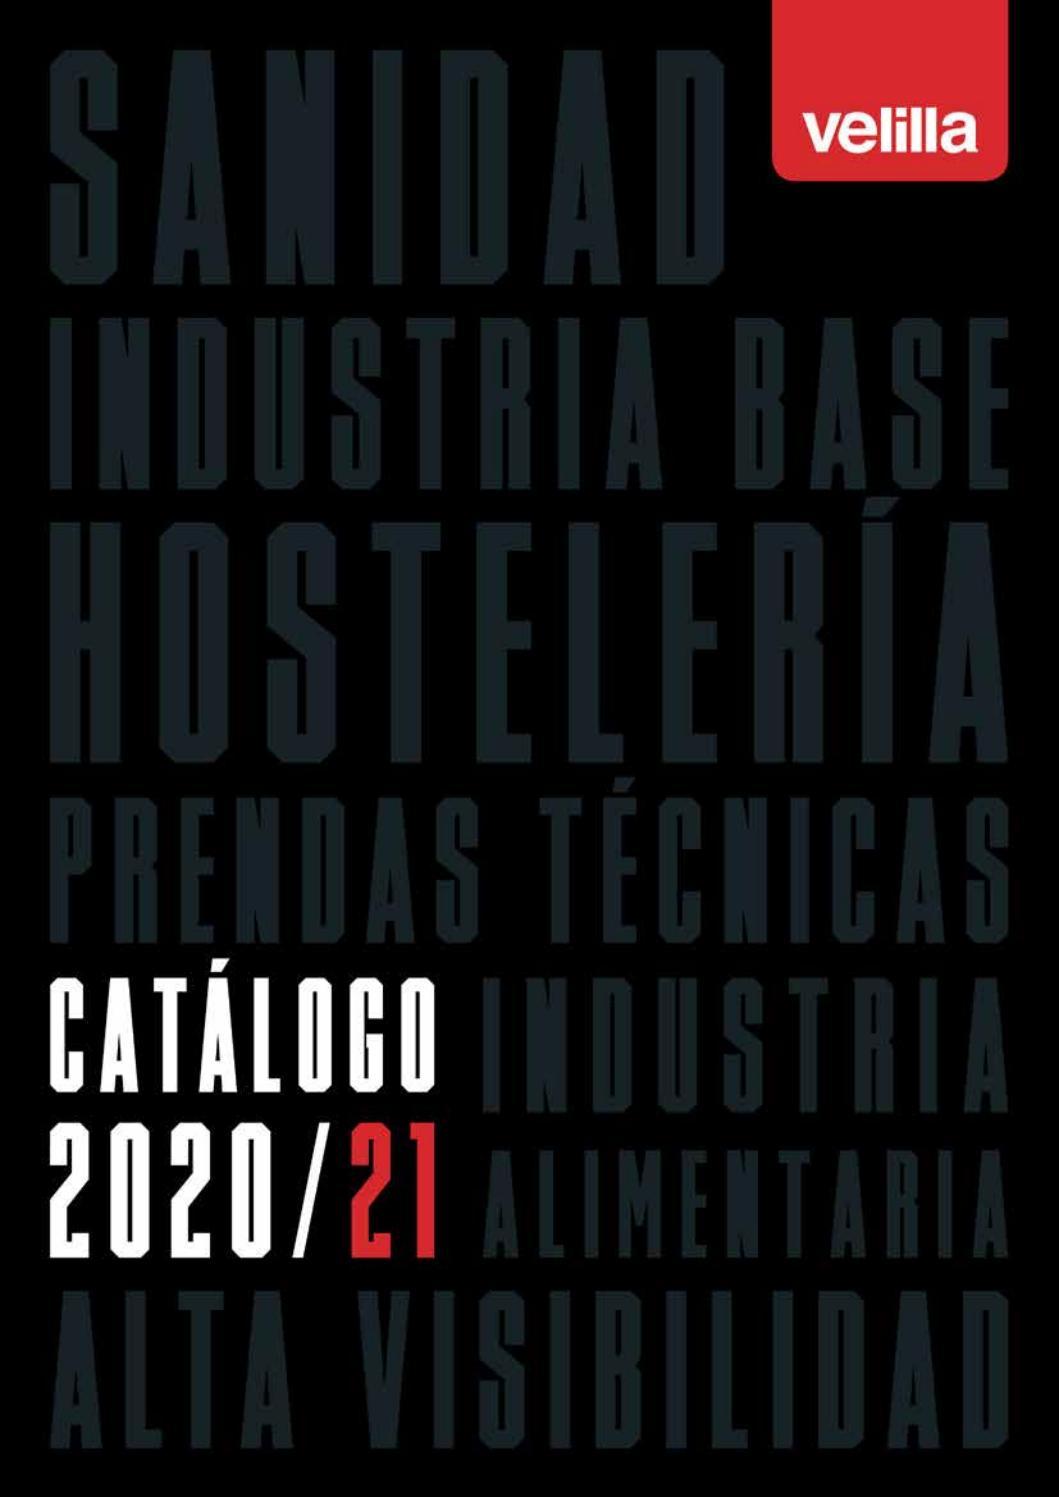 Merigor Aqui Uniformes Velilla Nuevo Catalogo 2020 2021 By